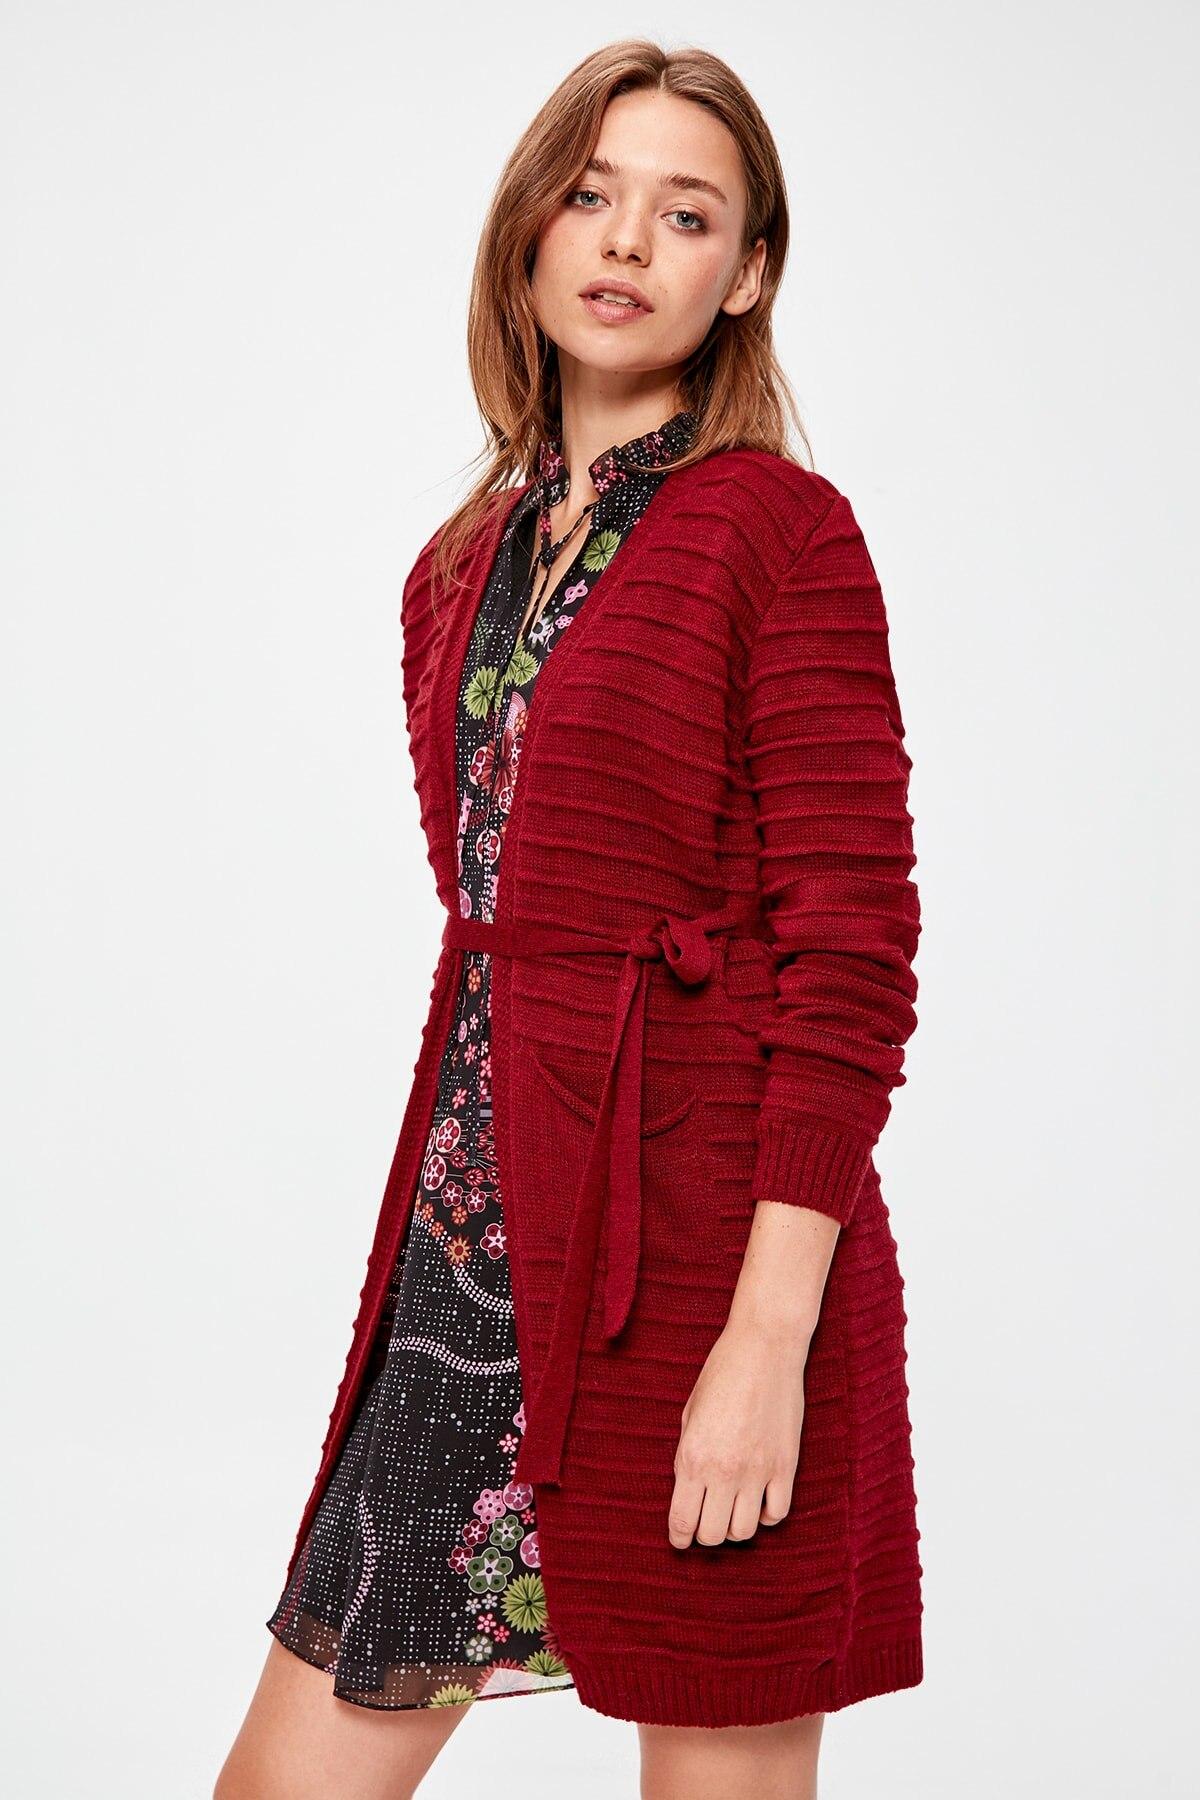 Trendyol Burgundy Sweater Cardigan TWOAW20HI0125